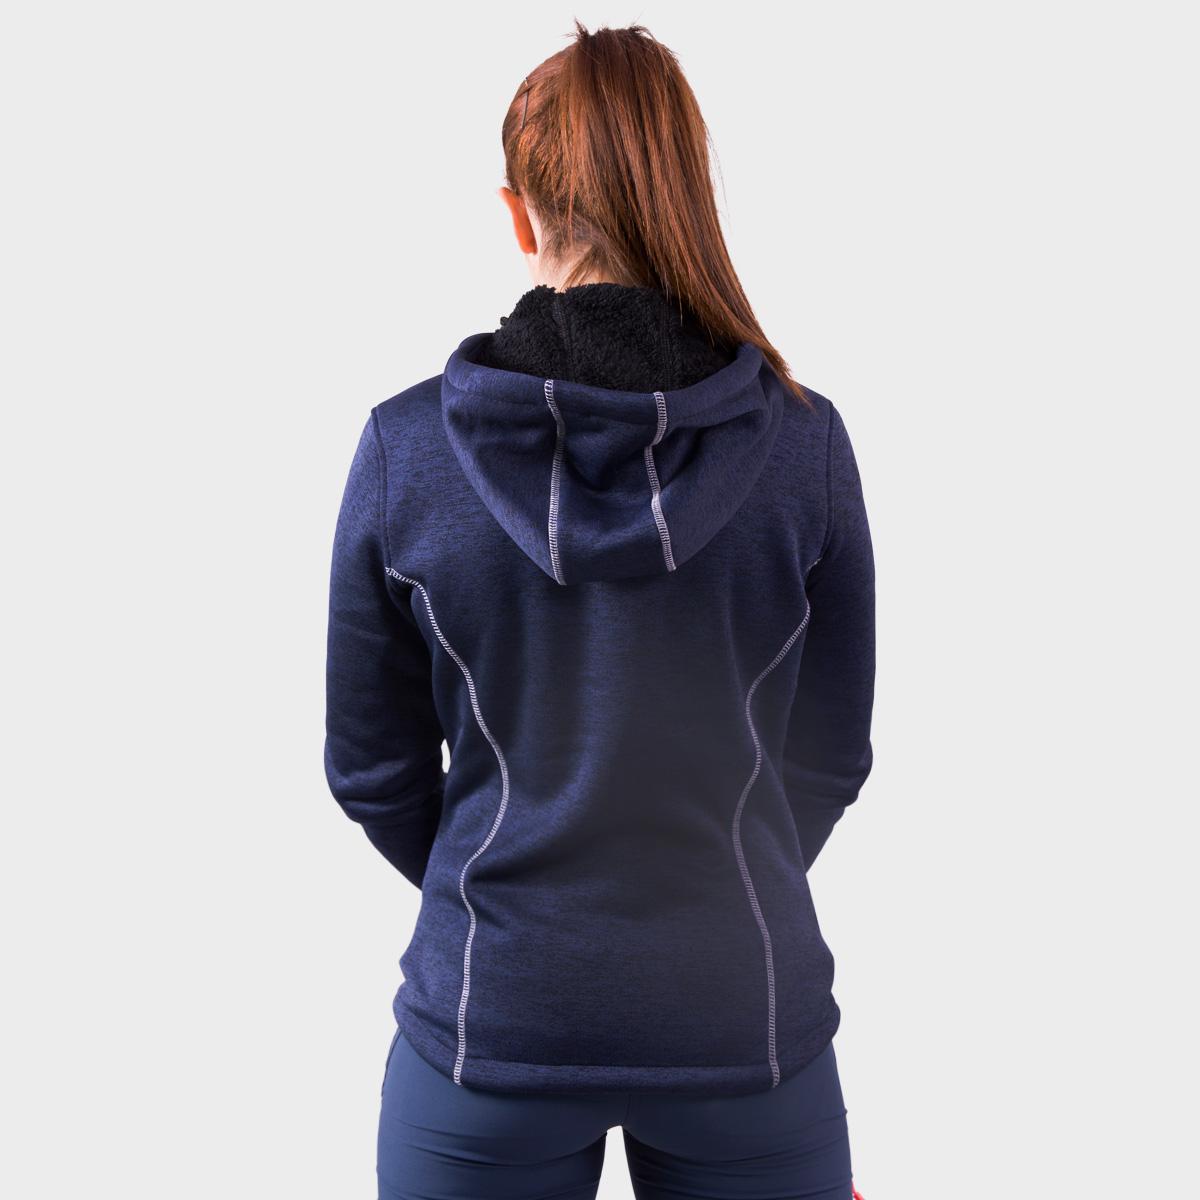 WOMAN'S GUARA LOOK WOOL JACKET BLUE